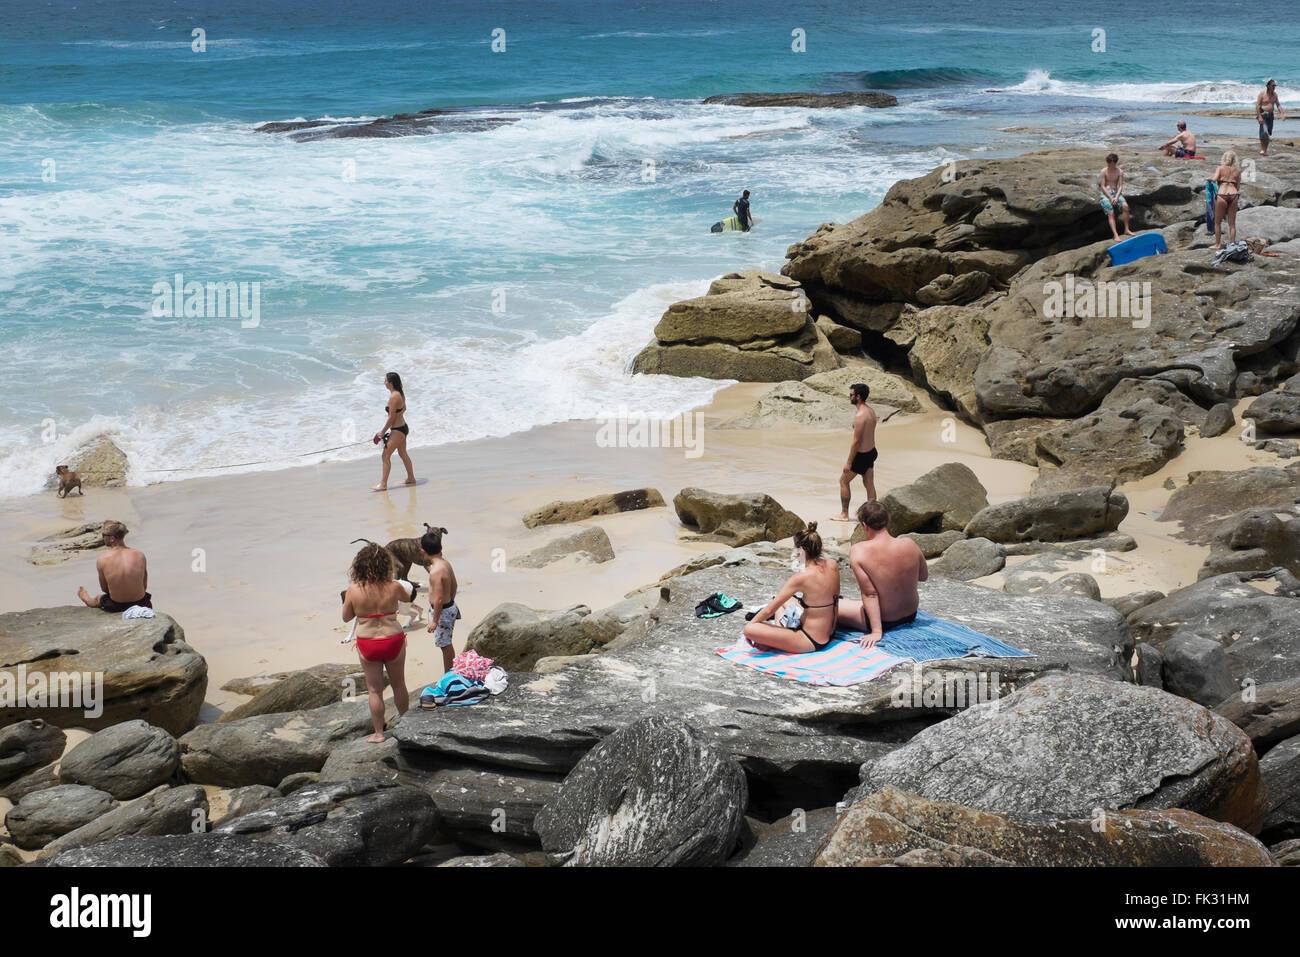 people in a cove along the Coogee to Bondi coastal walk, Sydney, NSW, Australia - Stock Image